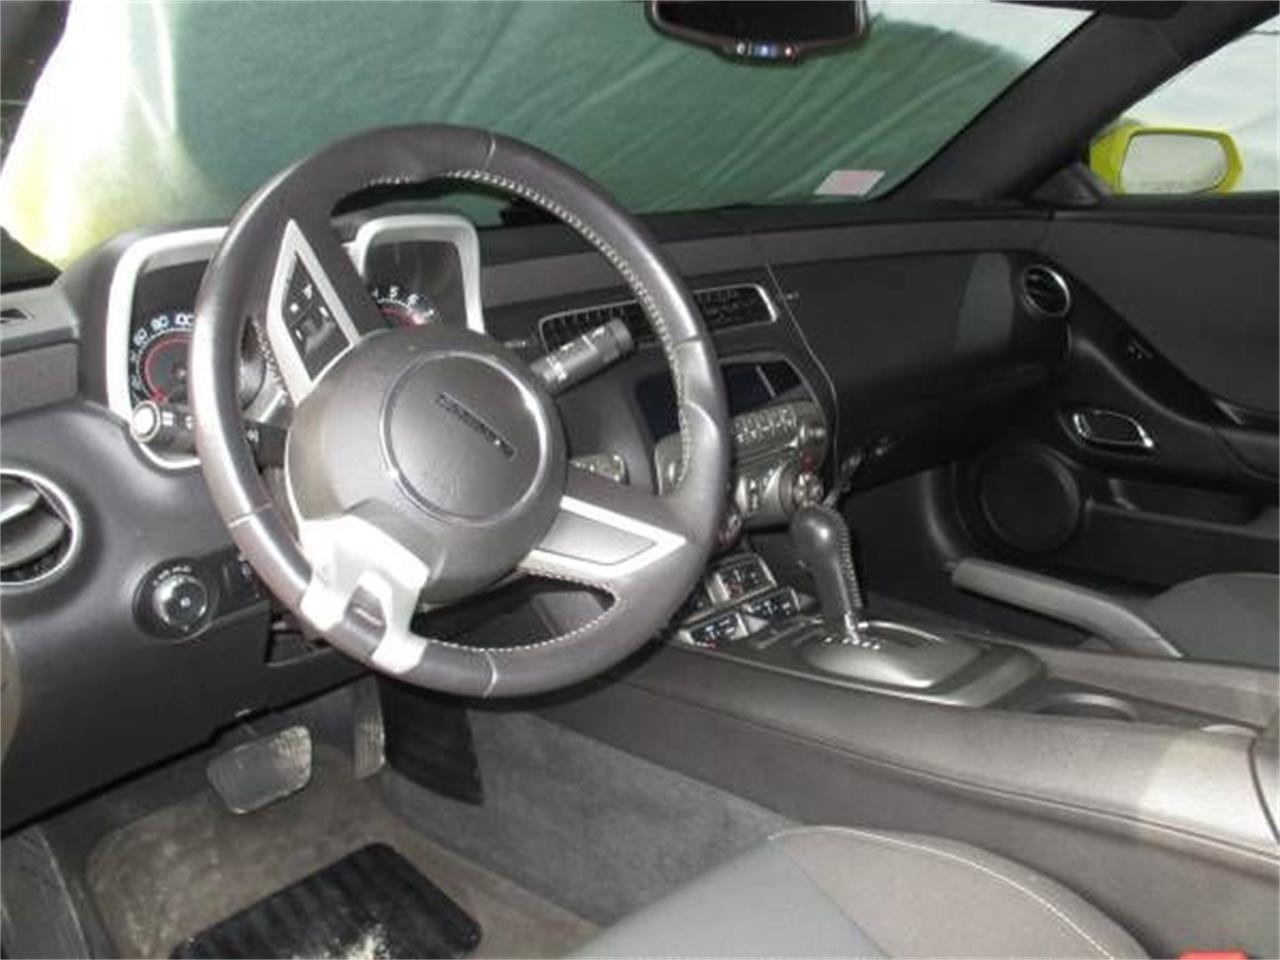 2010 Chevrolet Camaro (CC-1120778) for sale in Cadillac, Michigan